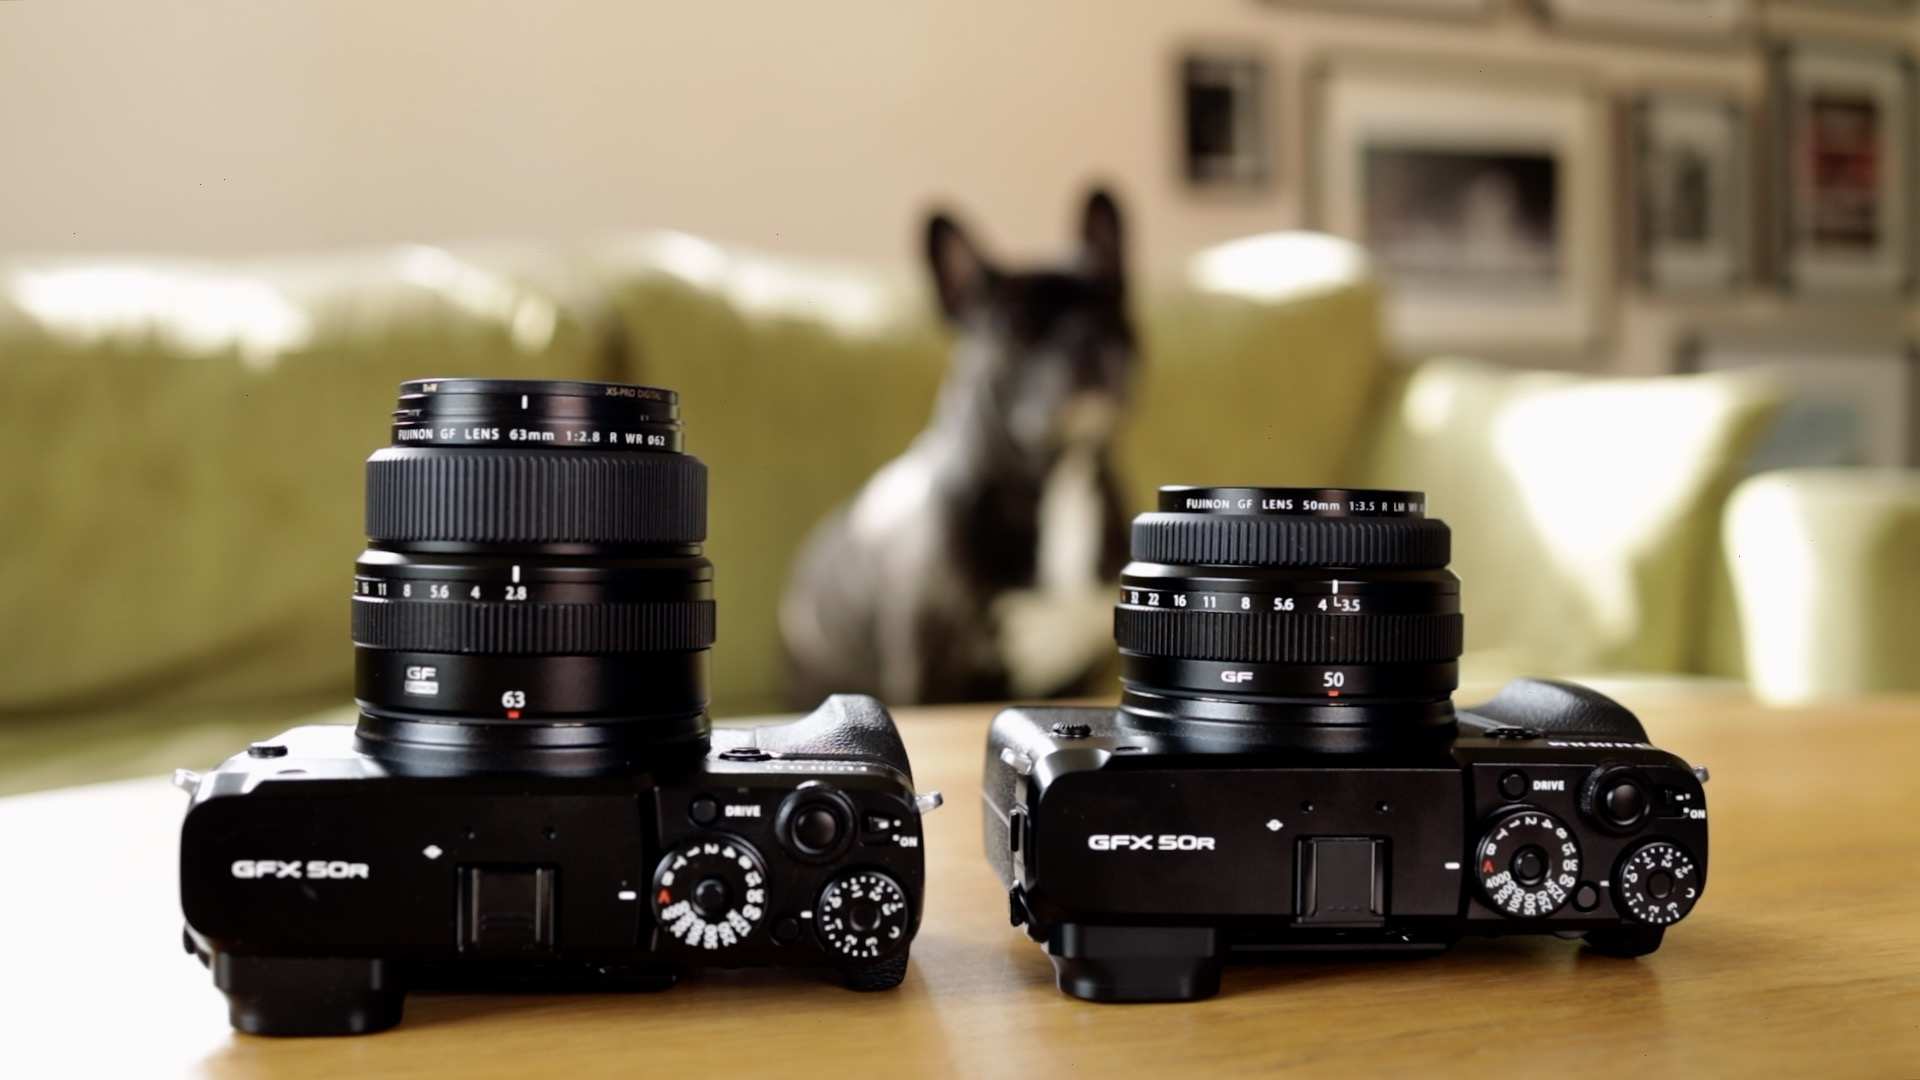 Fujifilm GF 50mm f3.5 vs 63mm f2.8 Review